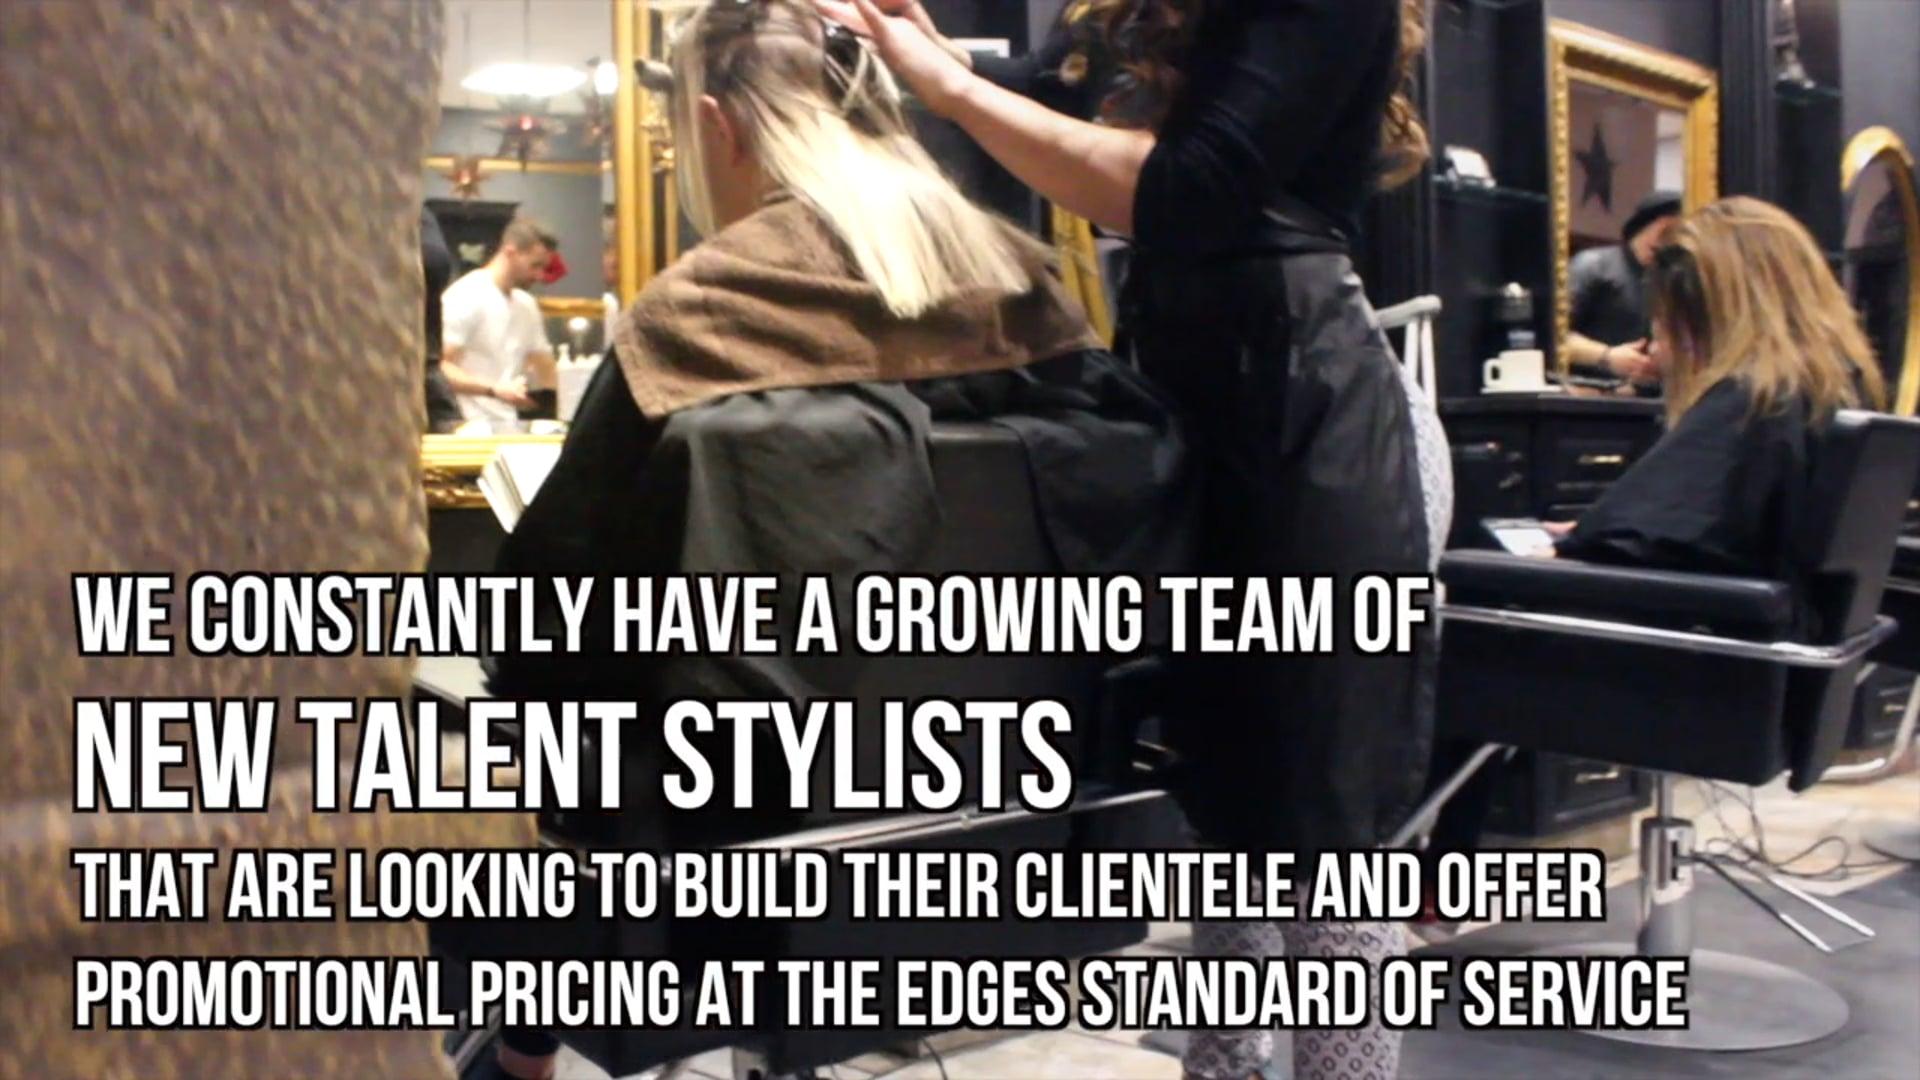 Edges Salon New Talent Stylist Promotion